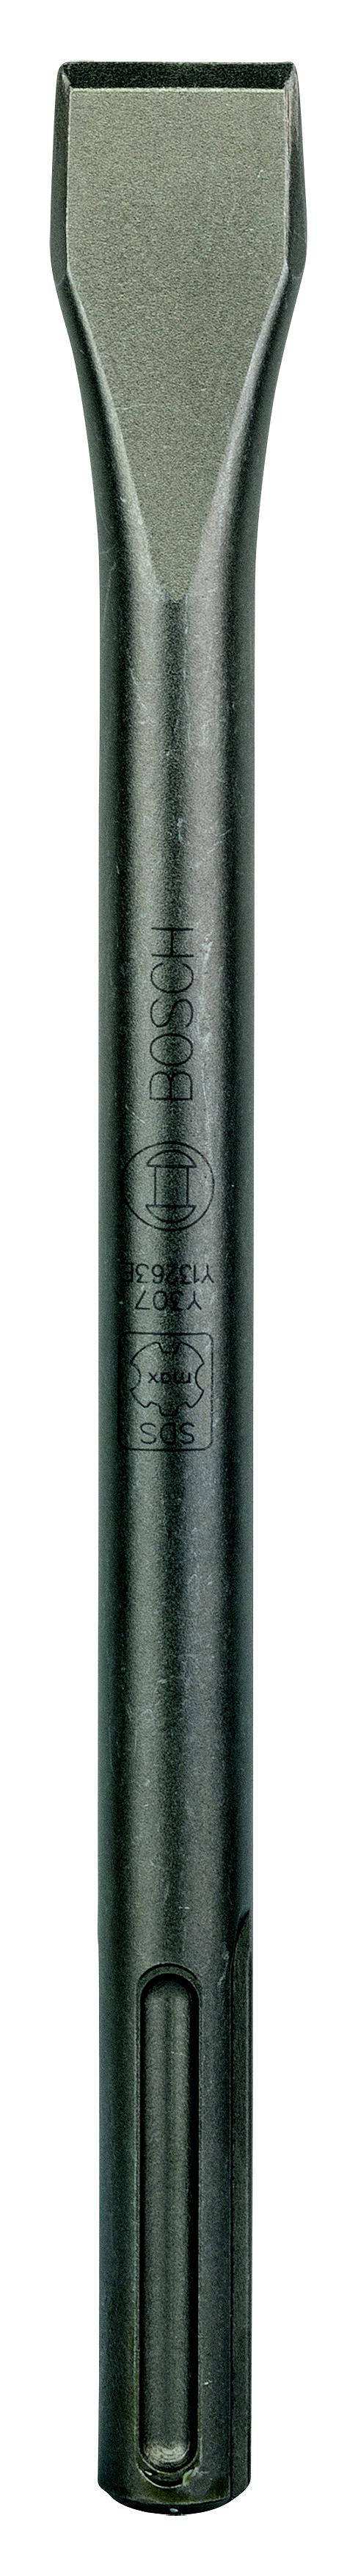 цена на Зубило Bosch Sdsmax 25x280 плоское (1.618.600.210)